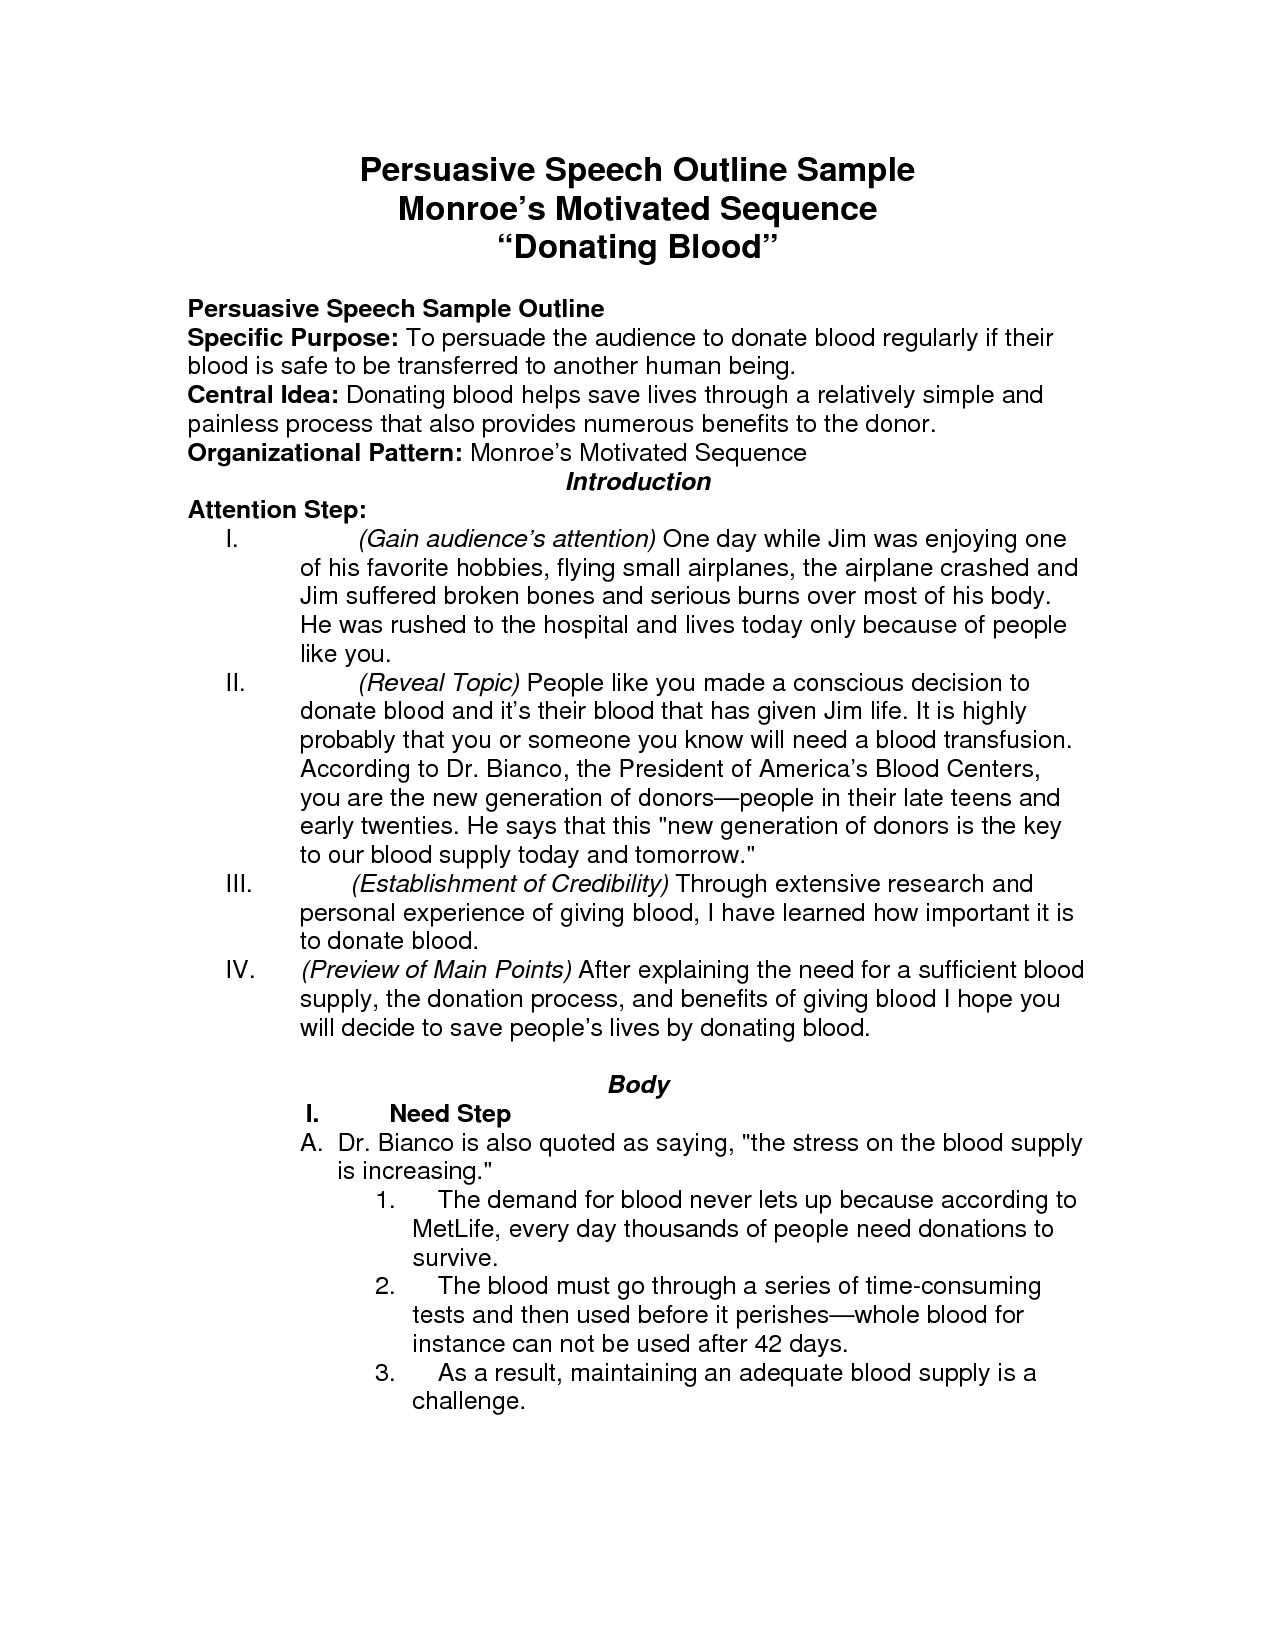 10 Fabulous Persuasive Speech Ideas For College Students speech essay outline bsc nurses resume format fractions homework 2020